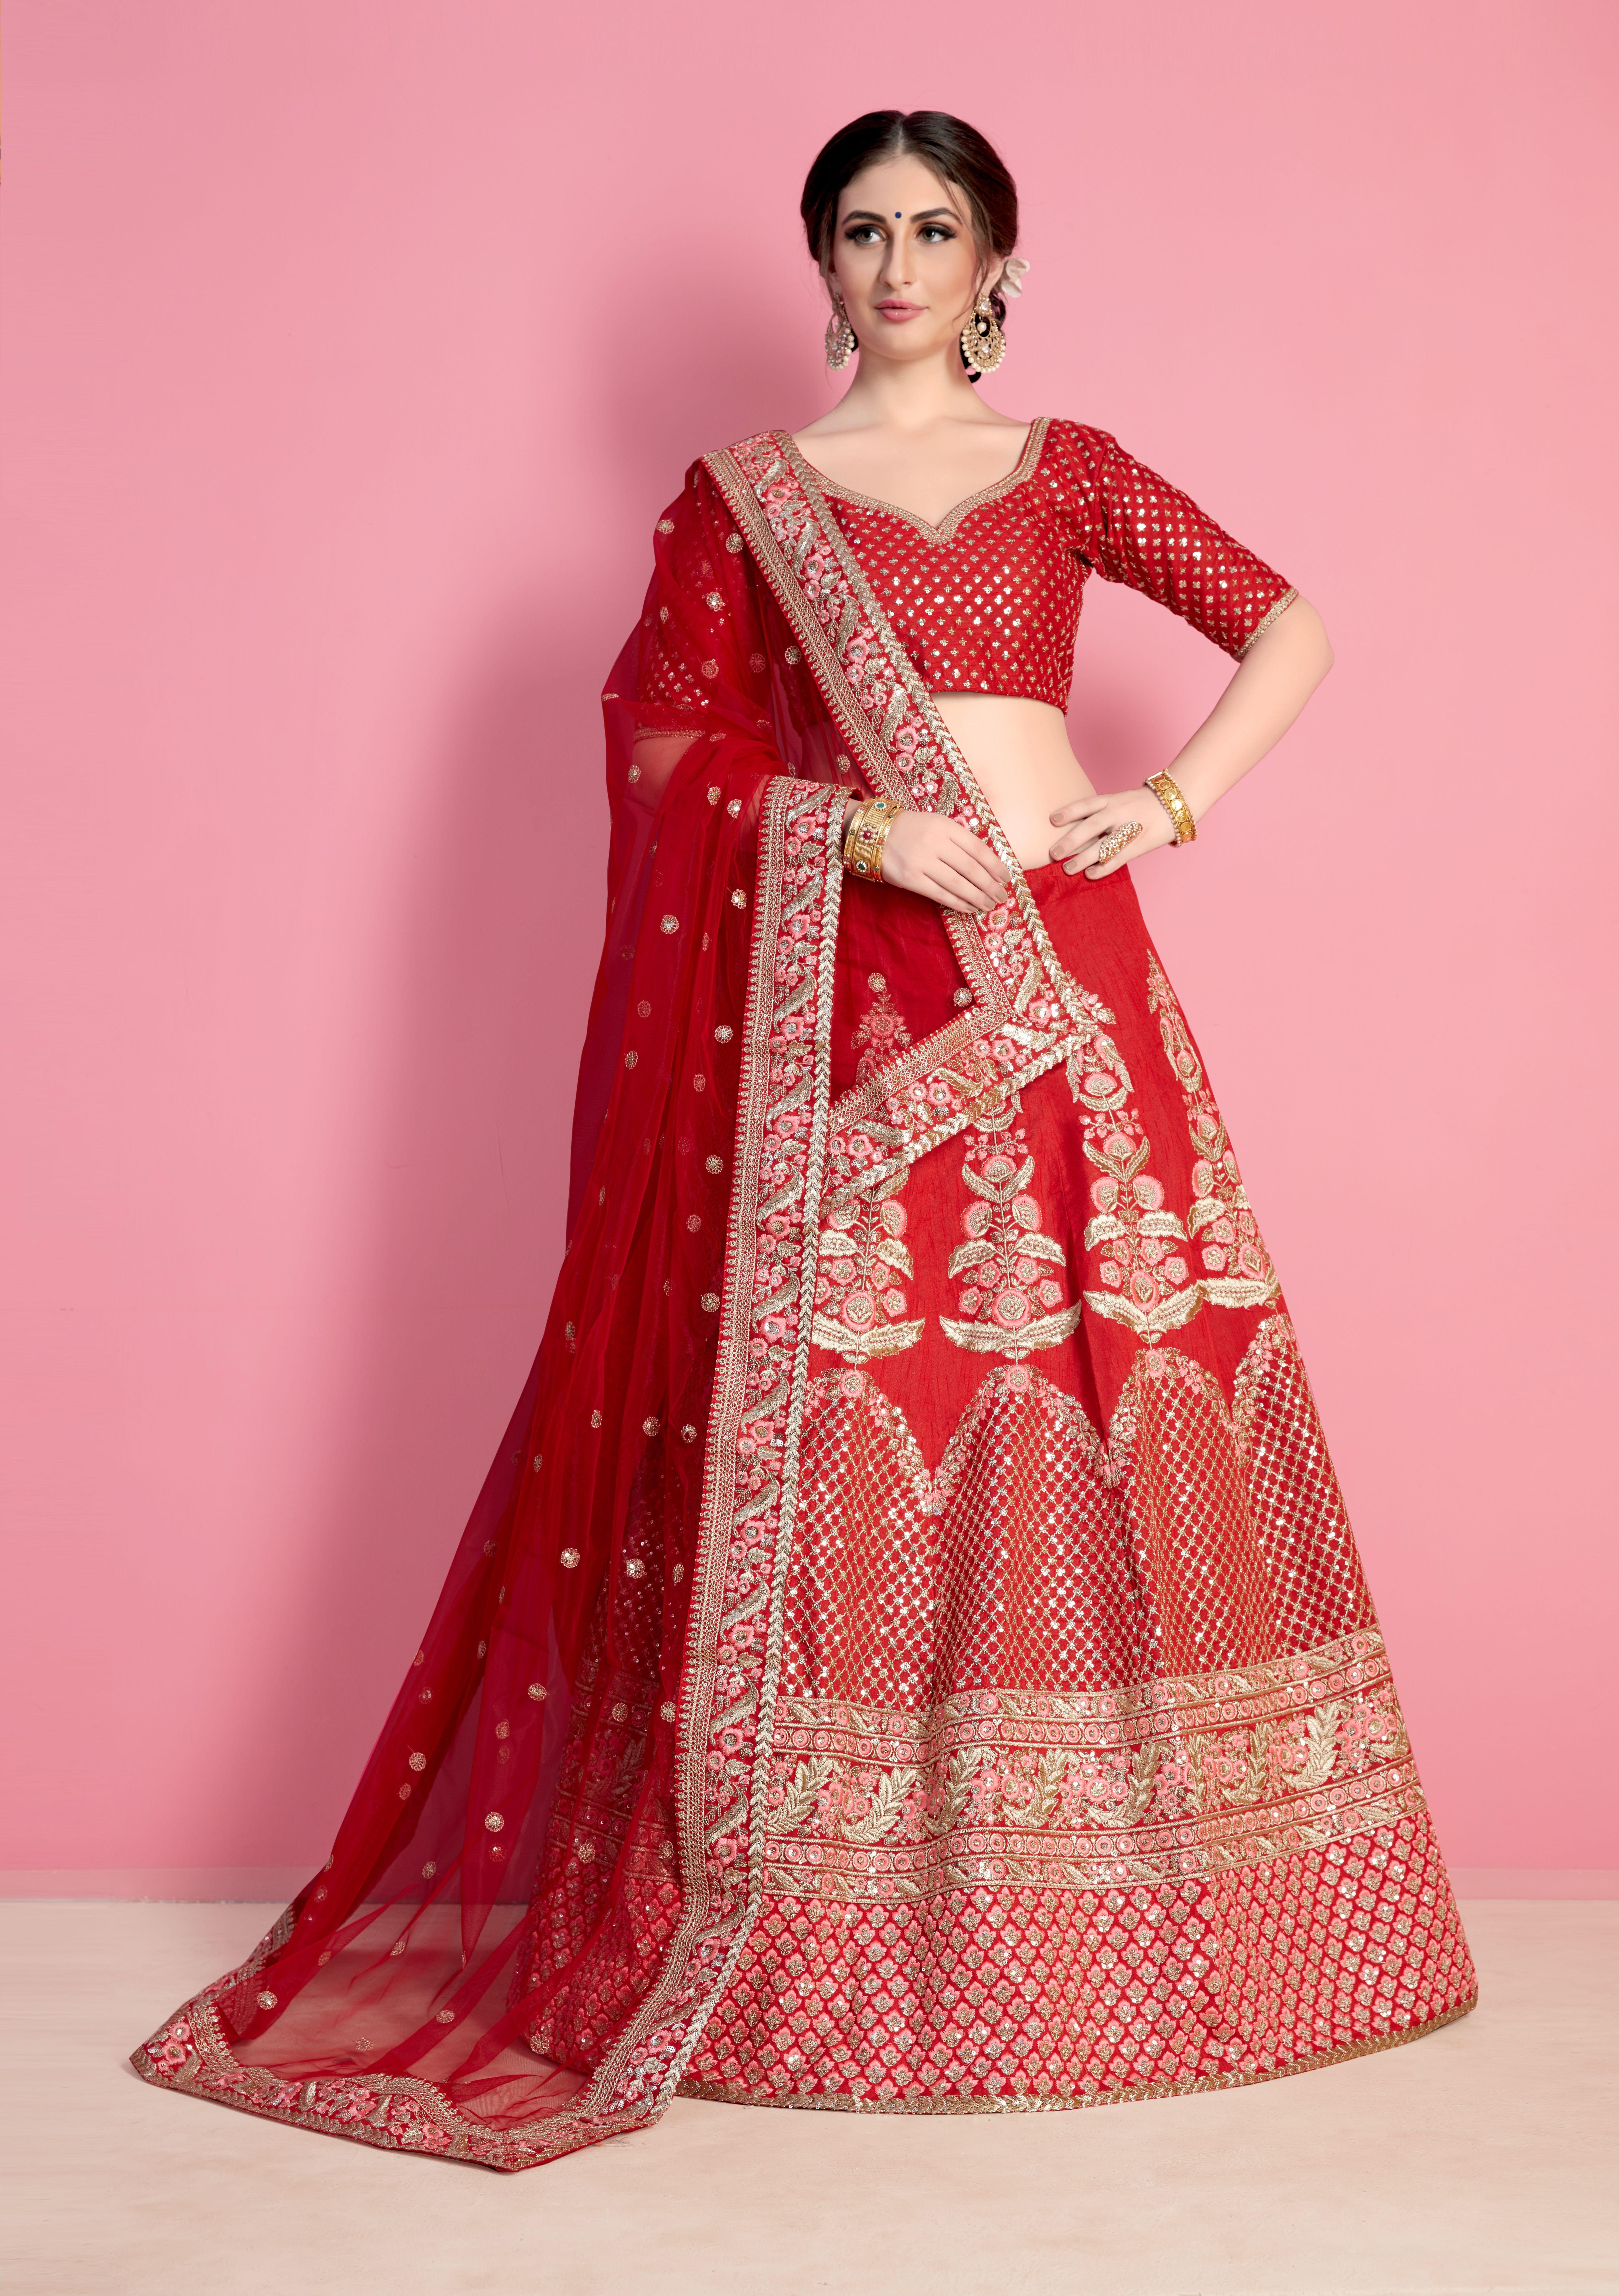 50b7ab67a0 Red art silk heavy embroidered bridal lehenga set. This lehenga set is  adorned with resham